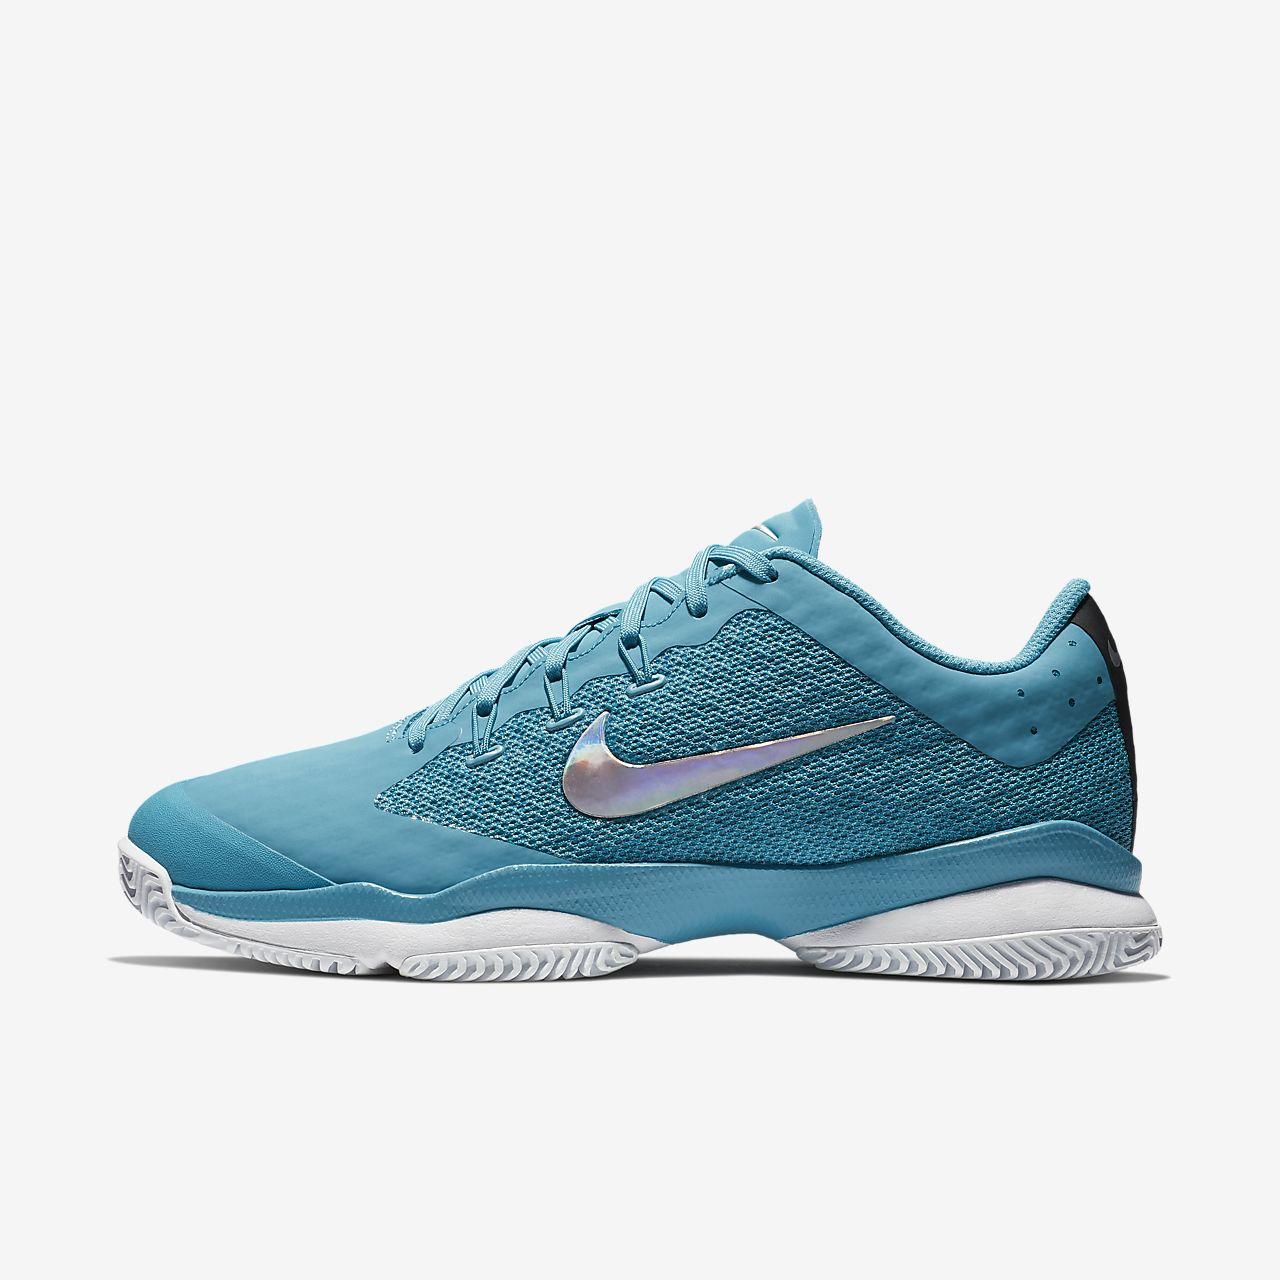 Nike Performance AIR ZOOM ULTRA - Outdoor tennis shoes - atmosphere grey/black white/blue/vast grey iPtKcpU7YO